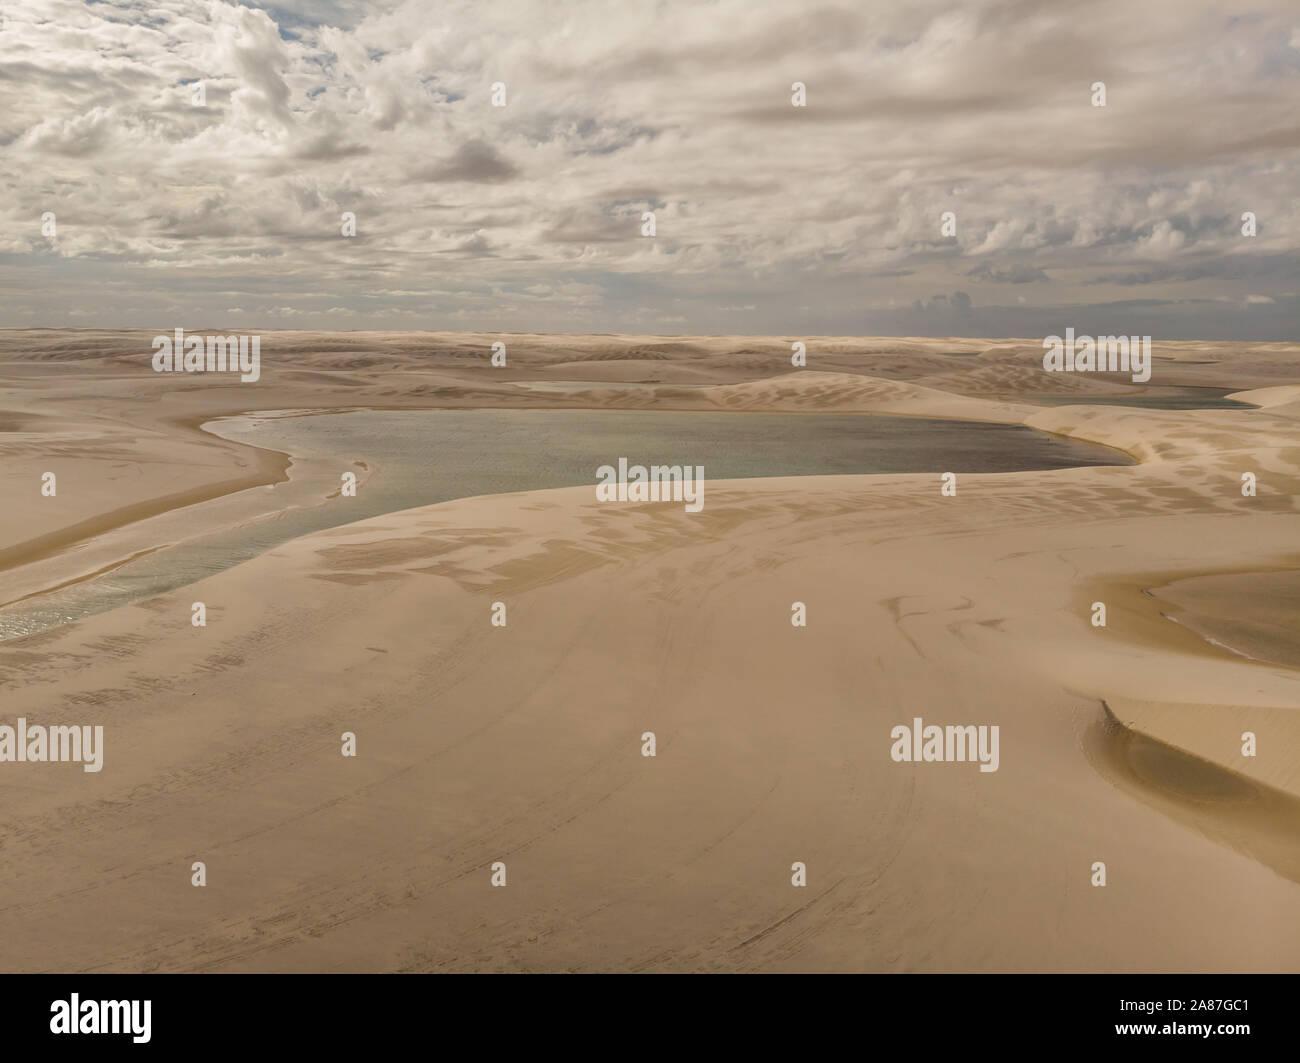 Ripresa aerea delle dune di sabbia e lagune in Brasile, Lencois Maranhenses national park in Maranhao membro.Lago azul Foto Stock